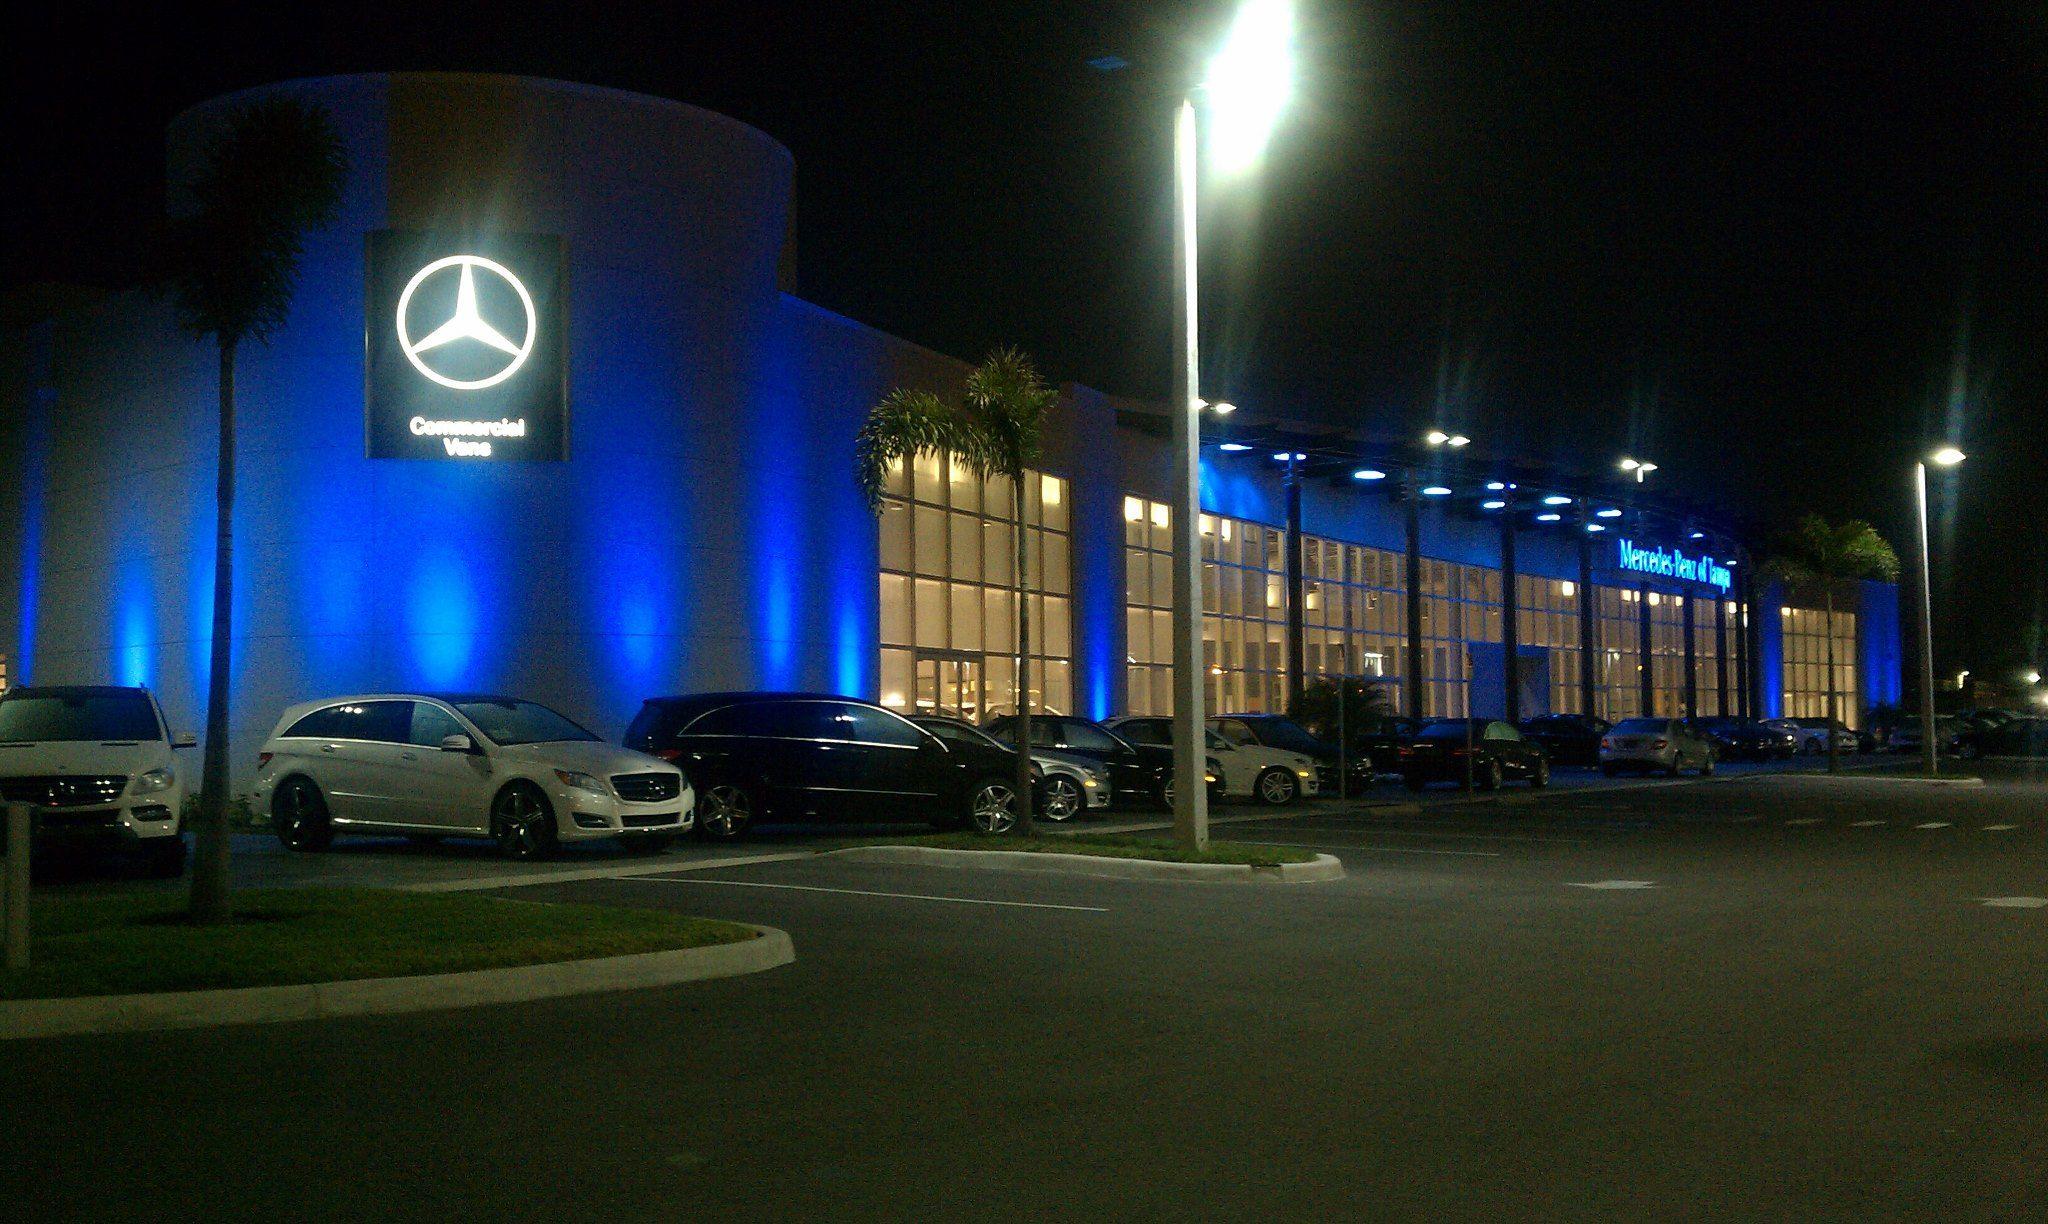 Mercedes Benz Of Tampa Lights Up The Sky Mercedes Benz Benz Mercedes